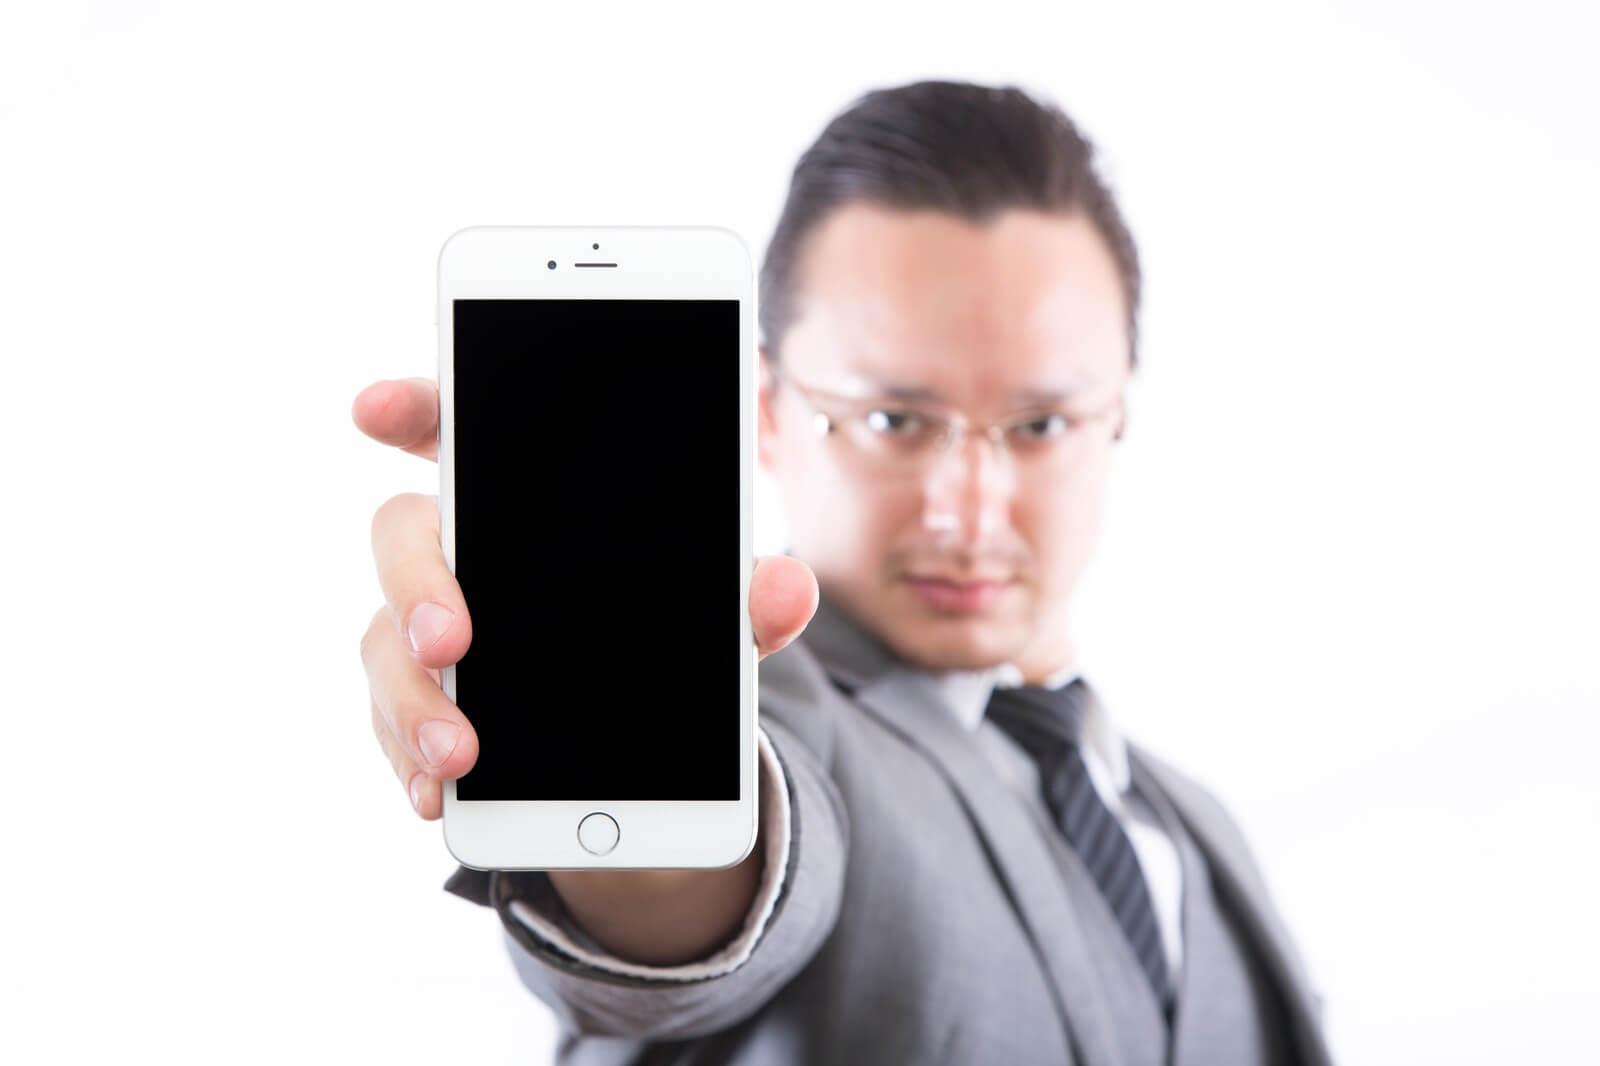 SIMロック解除(SIMフリー化)したドコモ(docomo)のiPhone